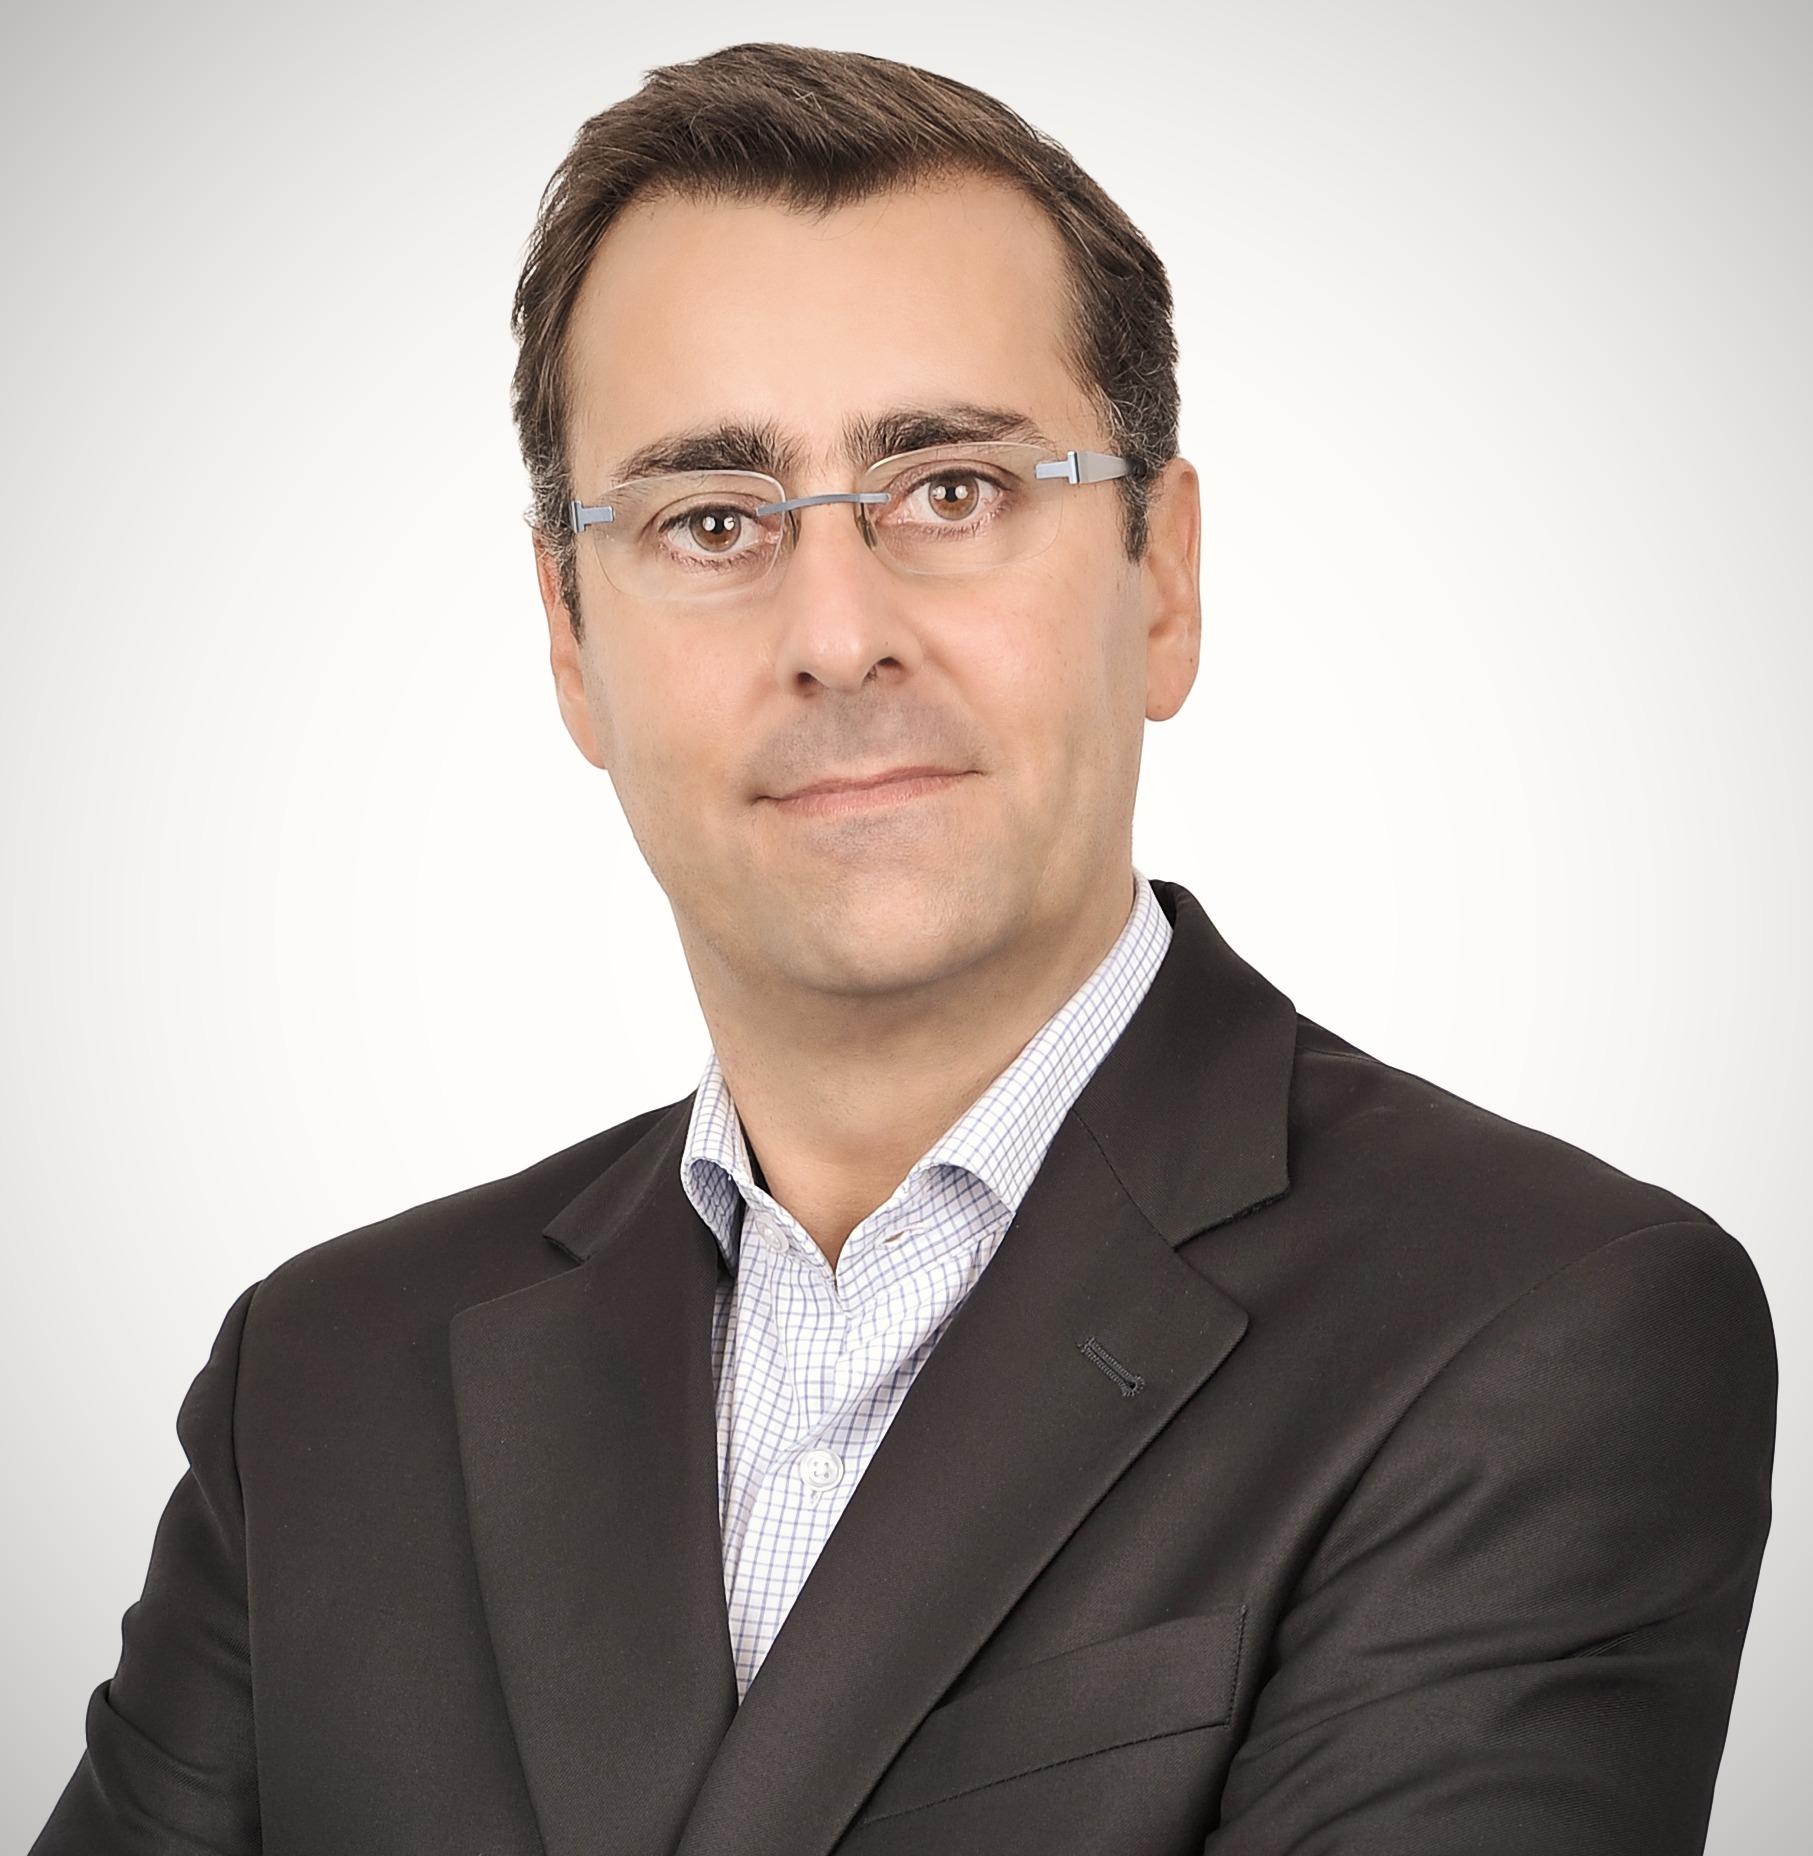 Jorge Tavares D'Almeida